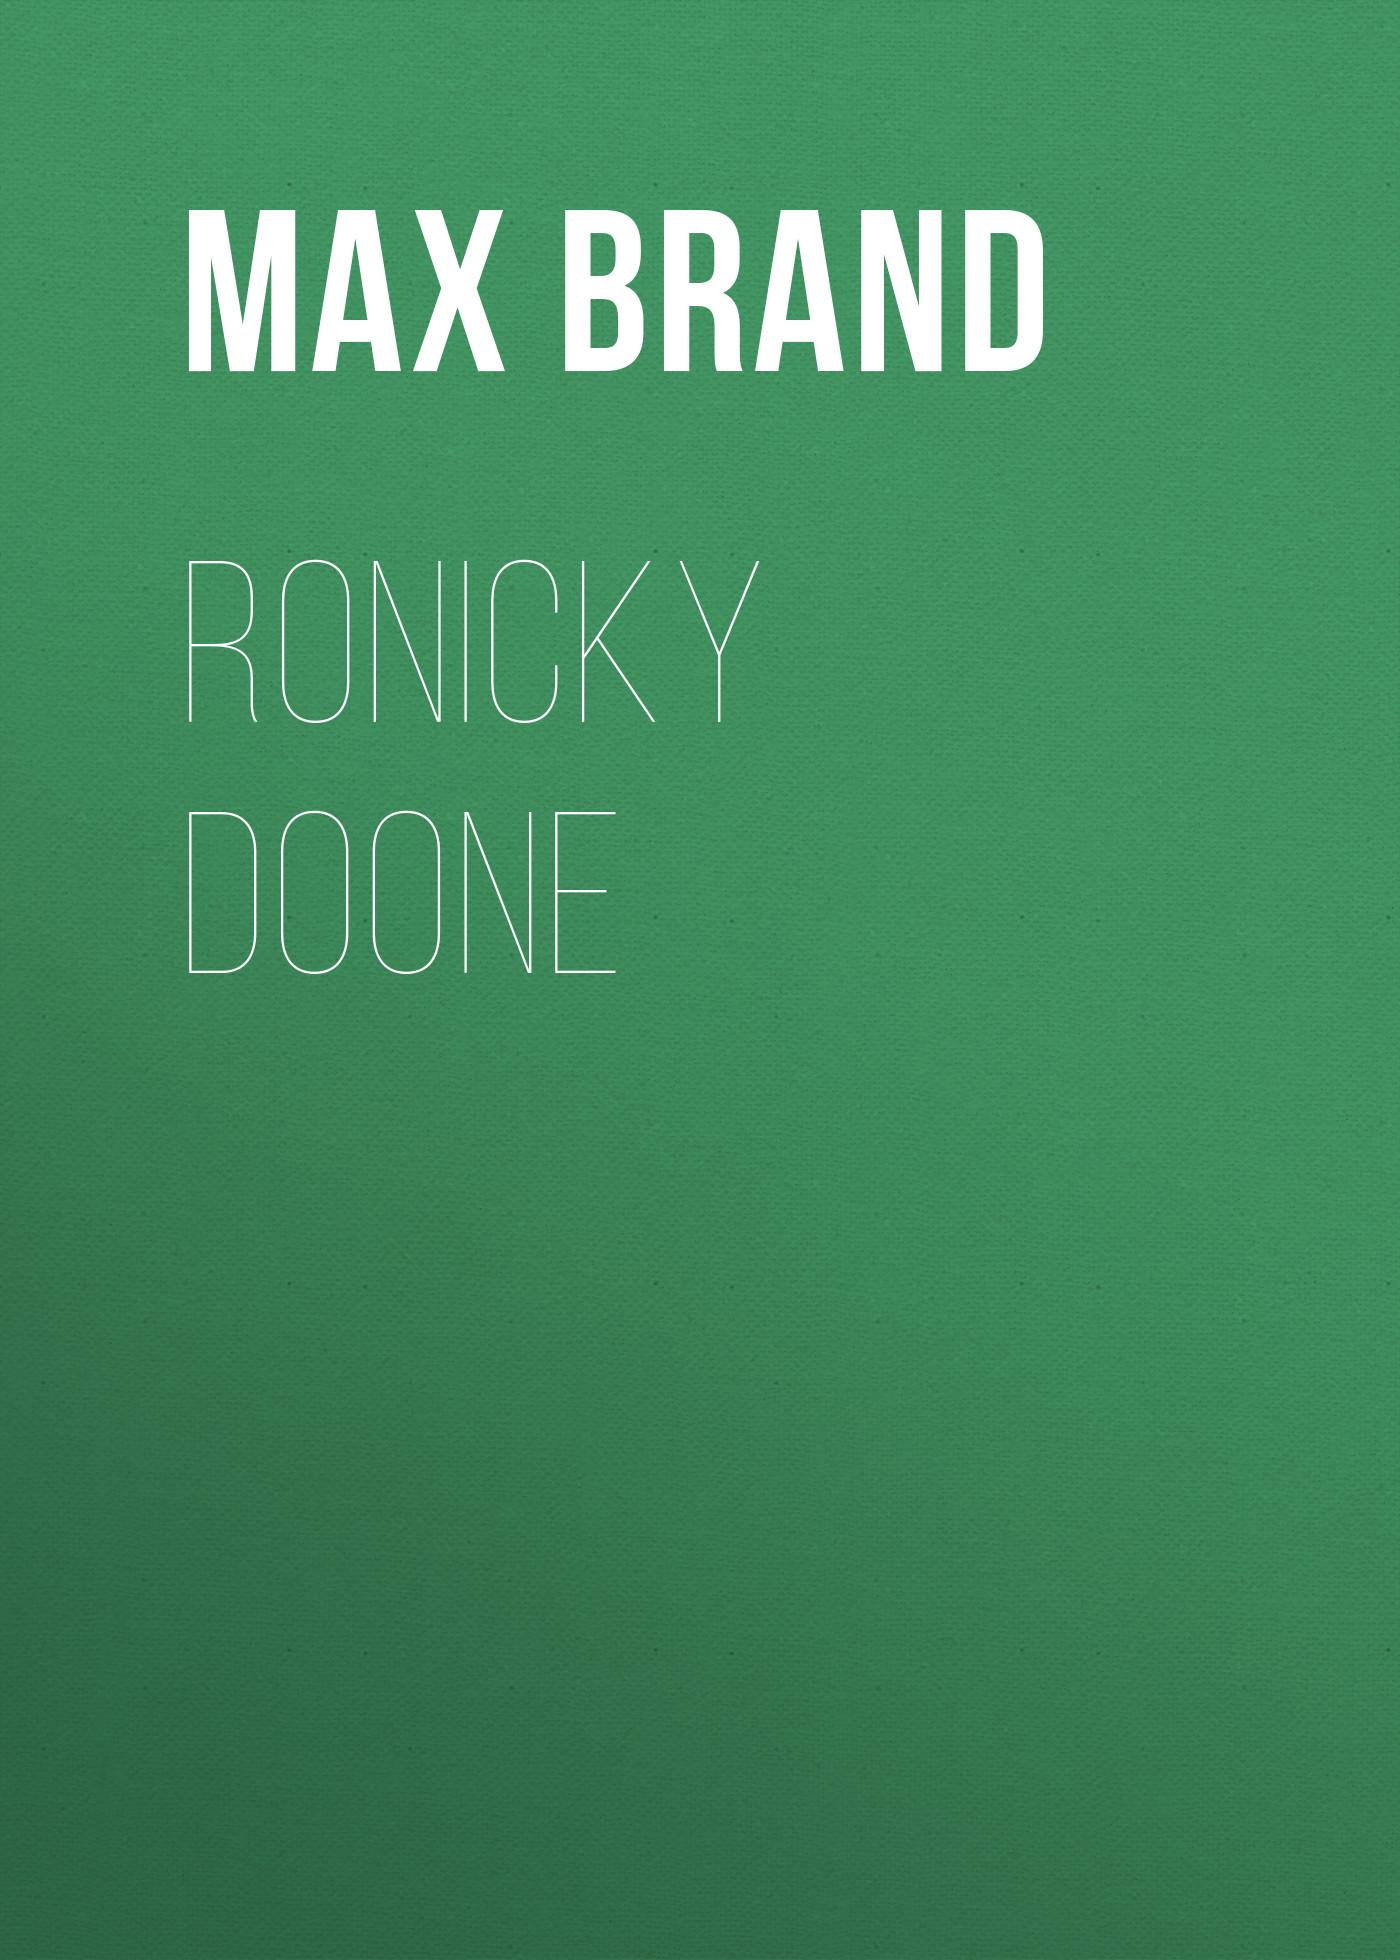 Max Brand Ronicky Doone стоимость